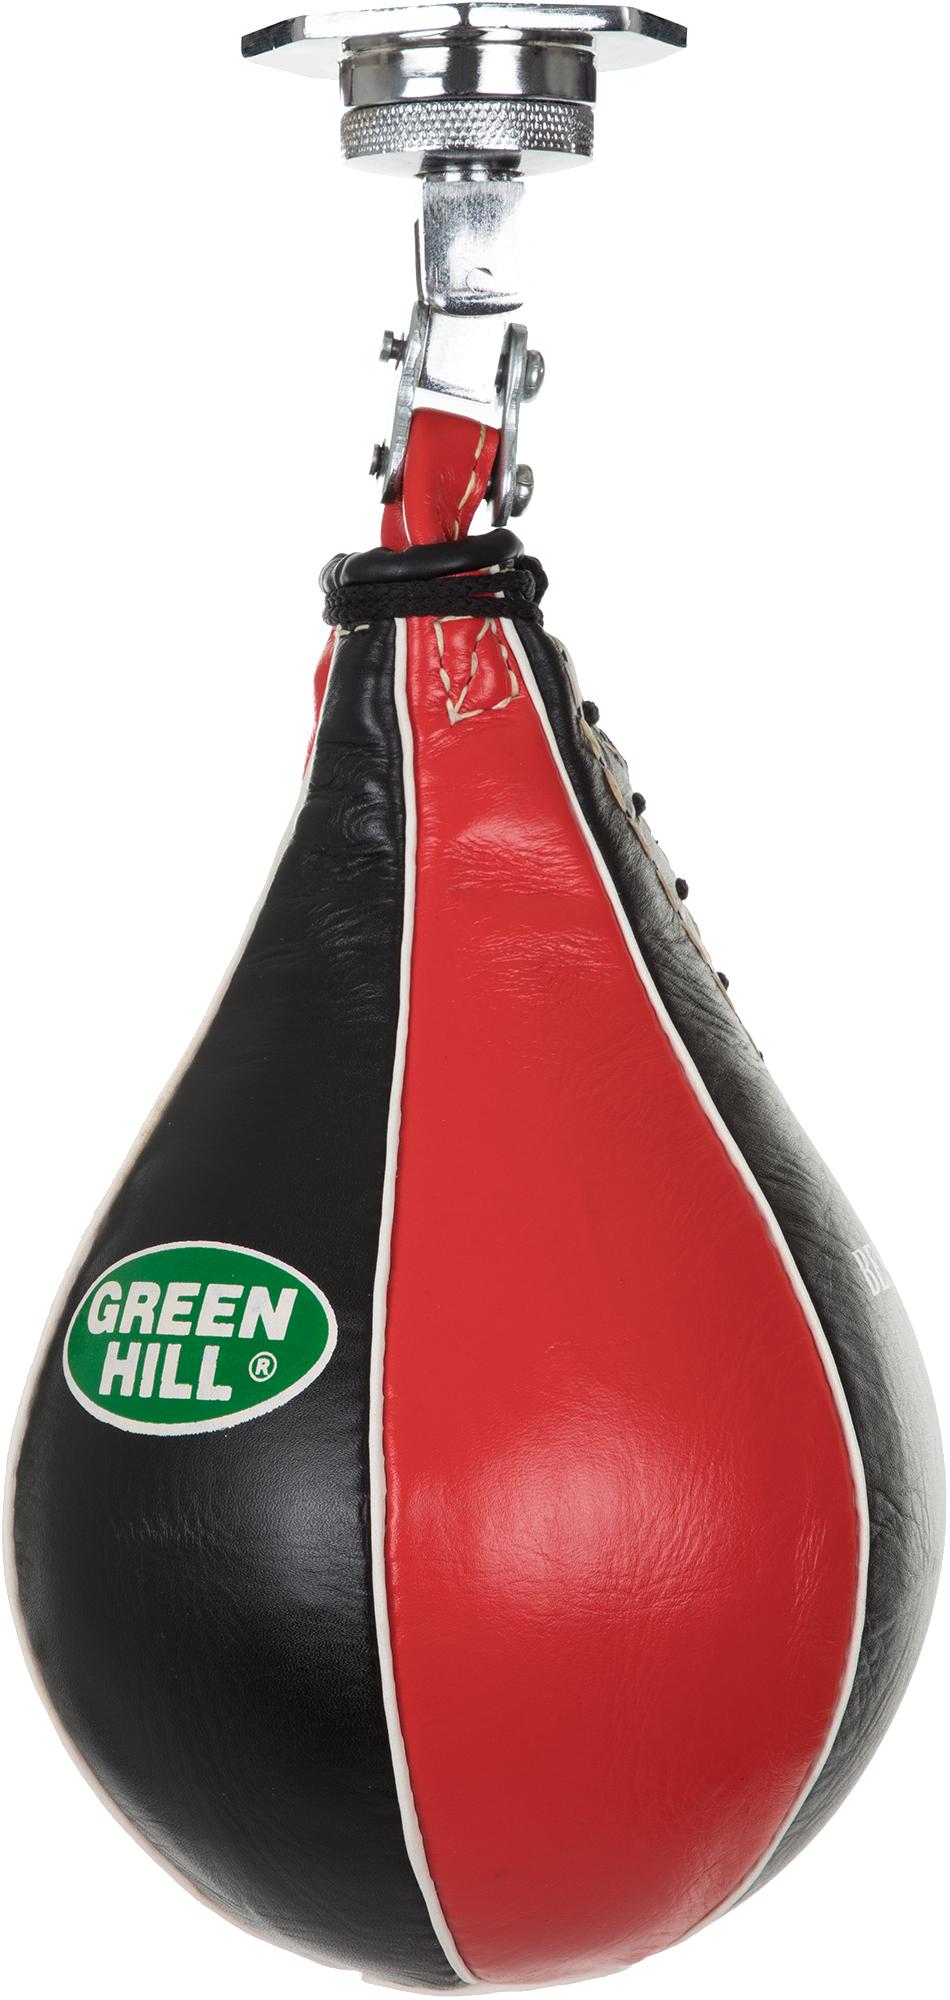 Green Hill Груша пневматическая Green Hill